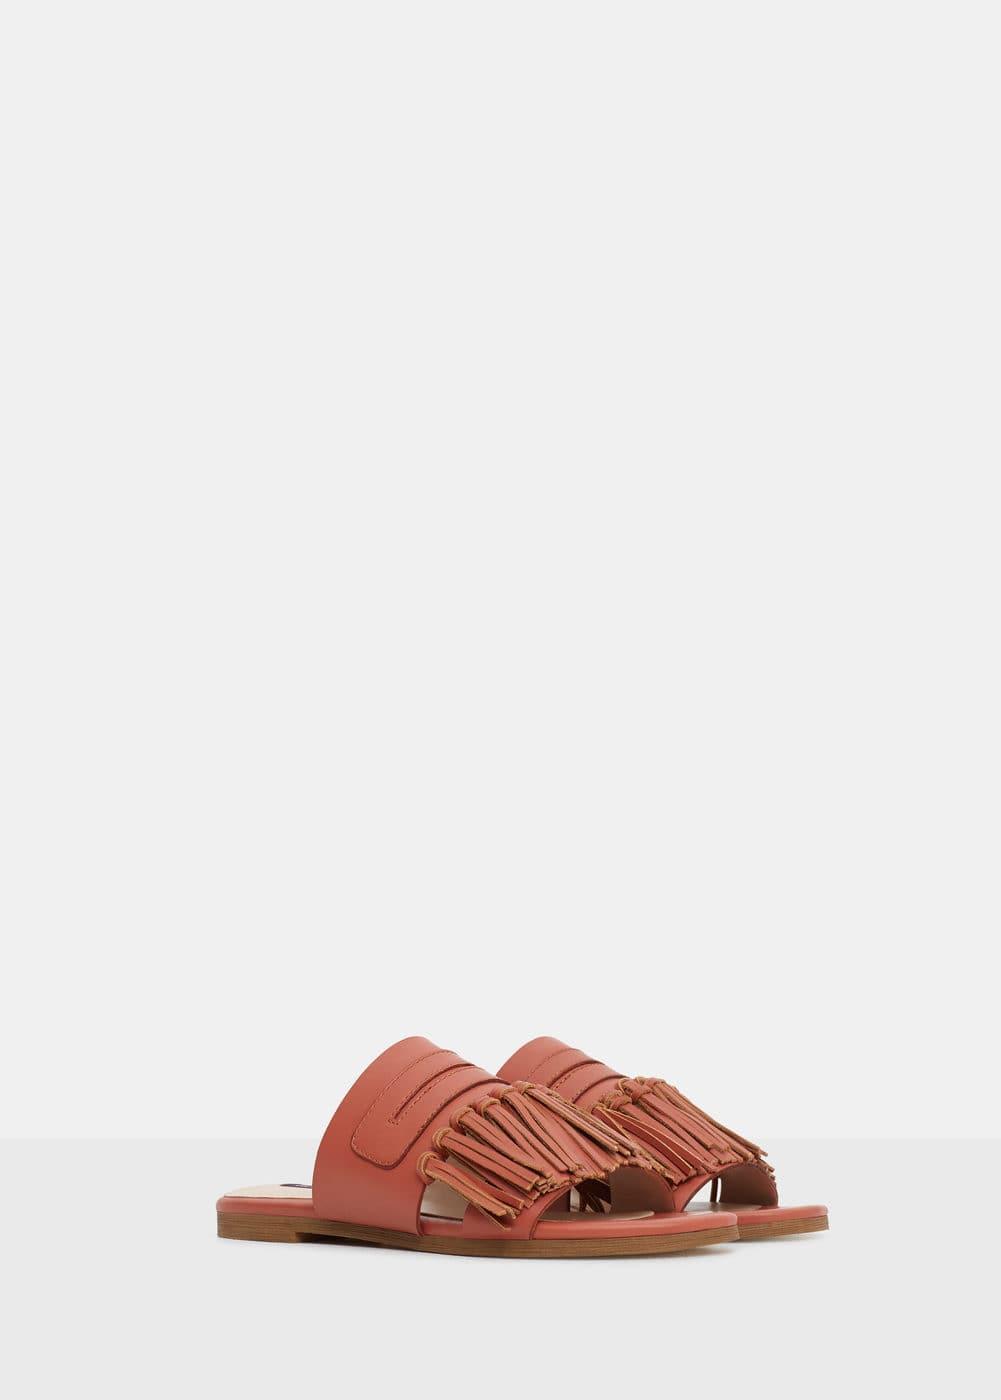 Fringe leather sandals   VIOLETA BY MANGO